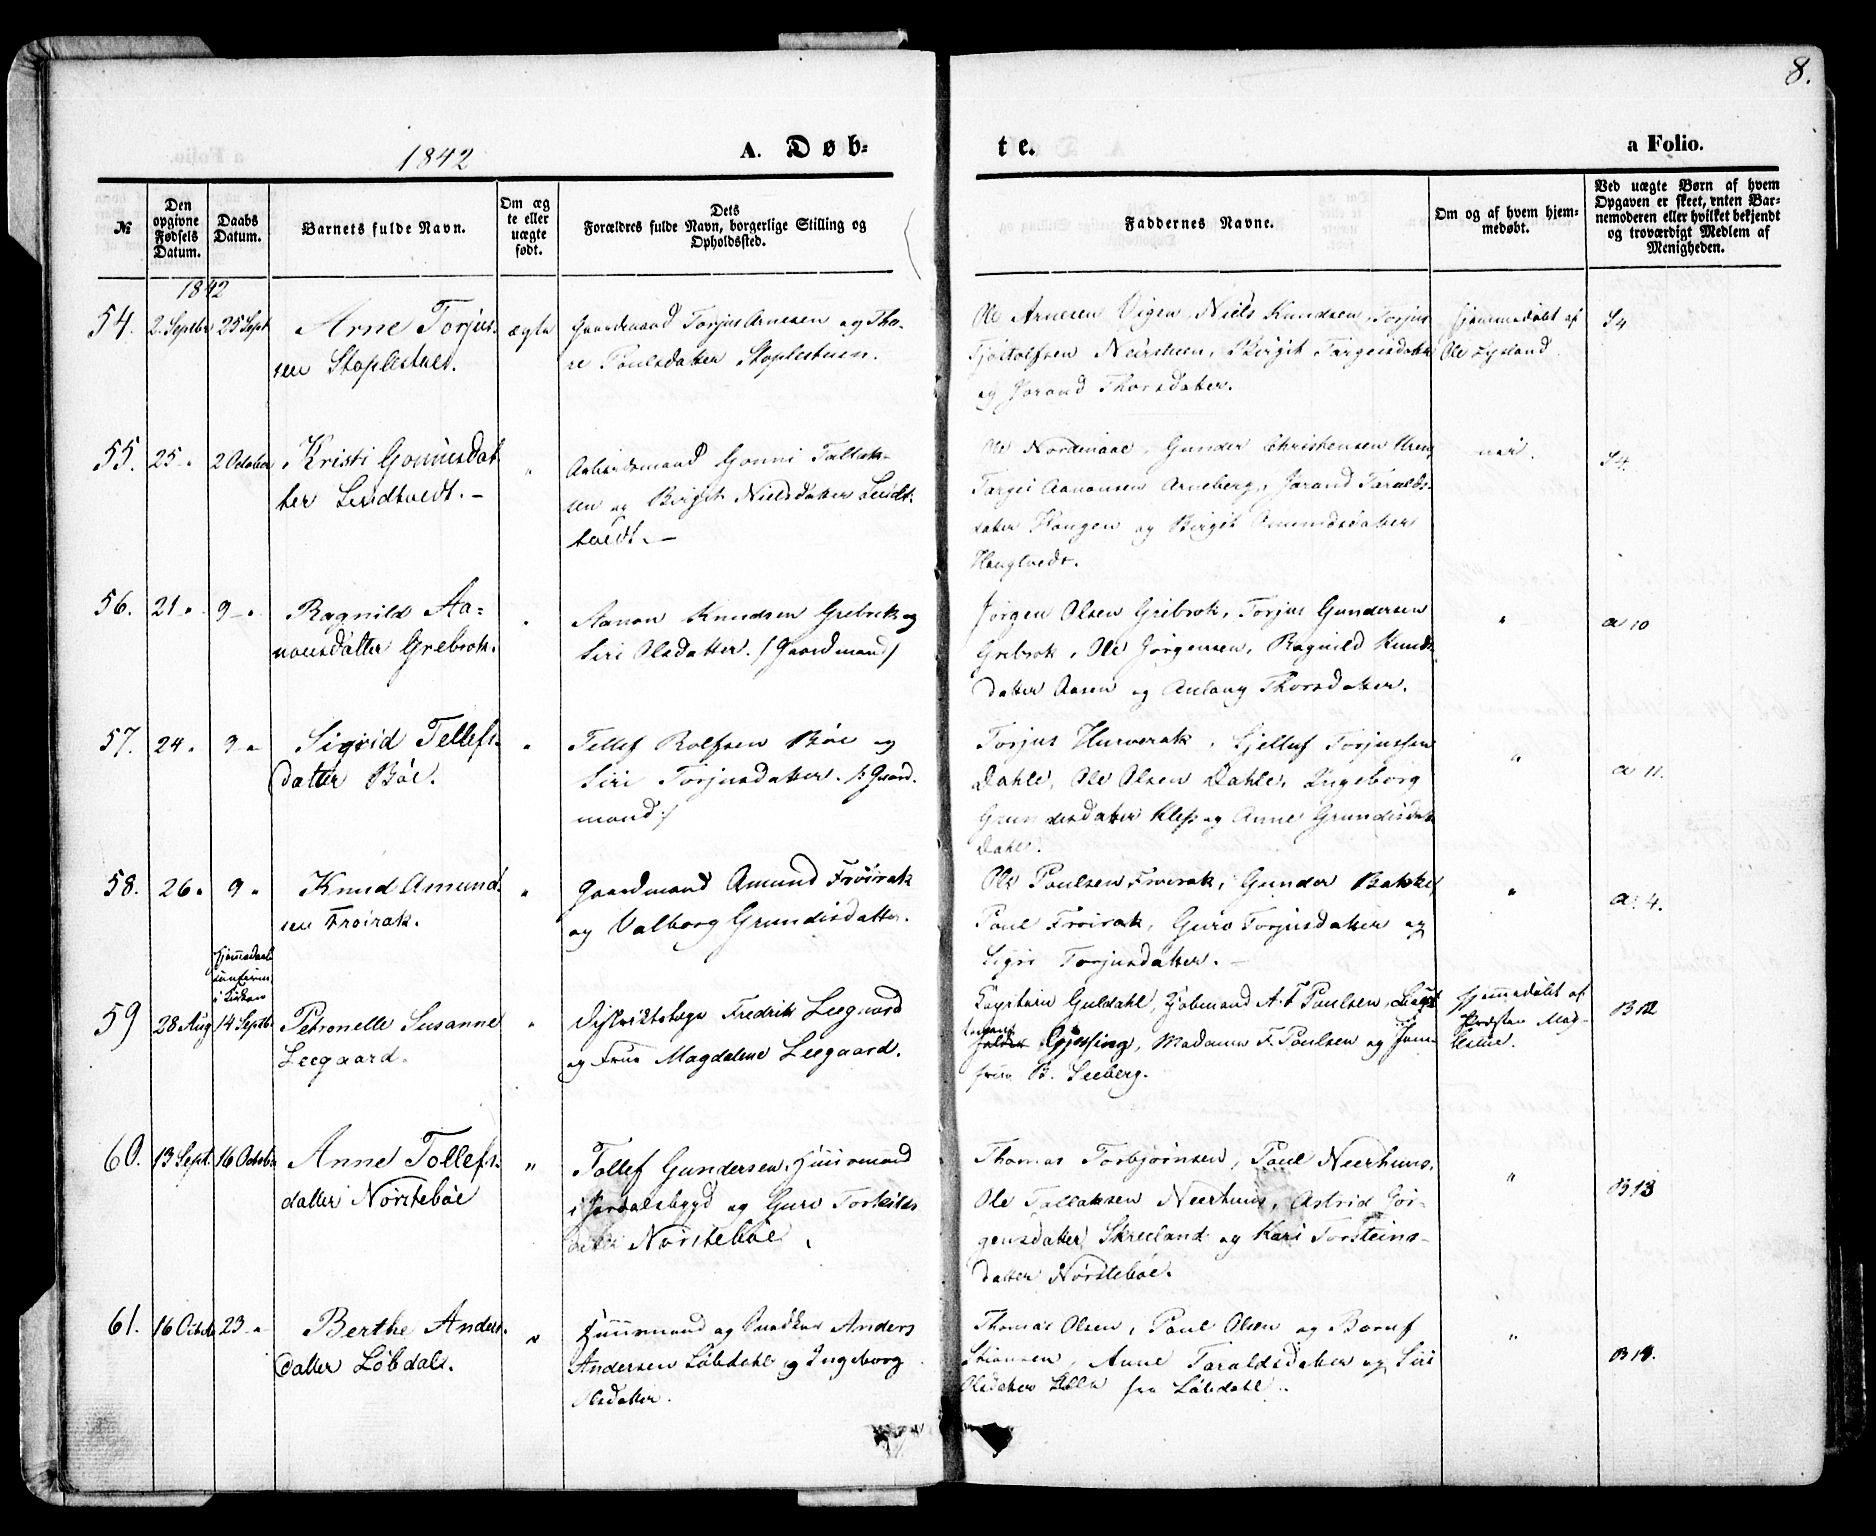 SAK, Bygland sokneprestkontor, F/Fa/Fab/L0004: Ministerialbok nr. A 4, 1842-1858, s. 8